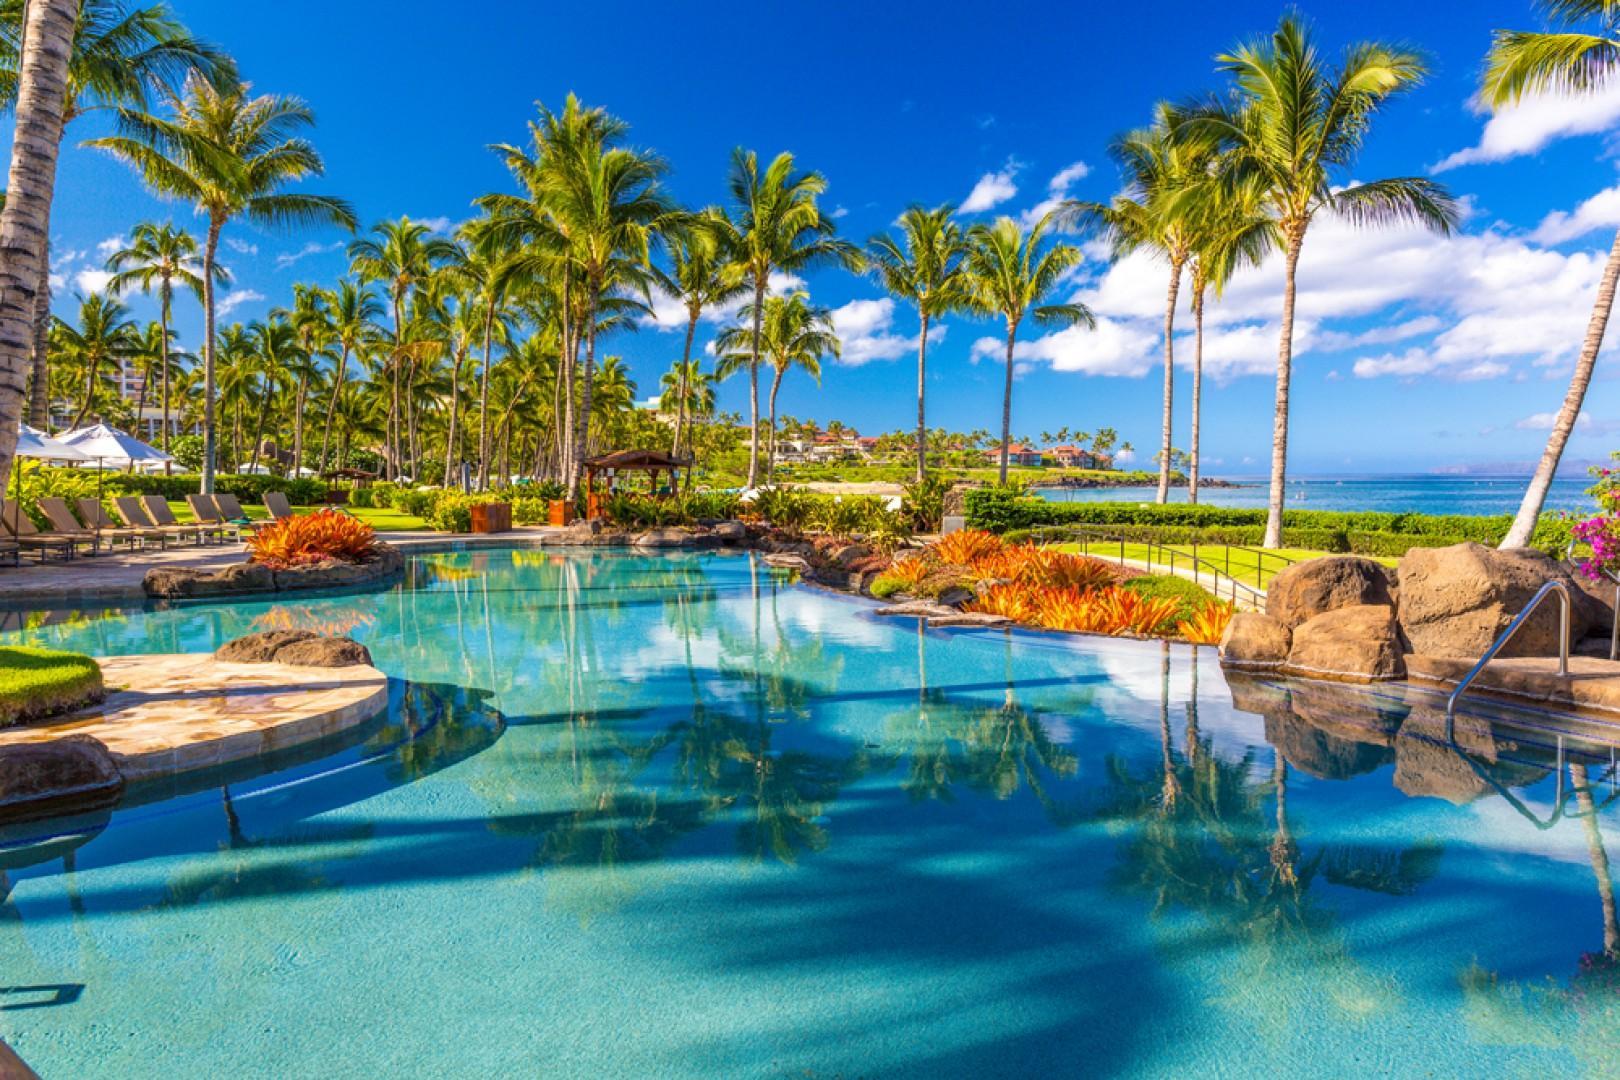 Stunning tropical views!